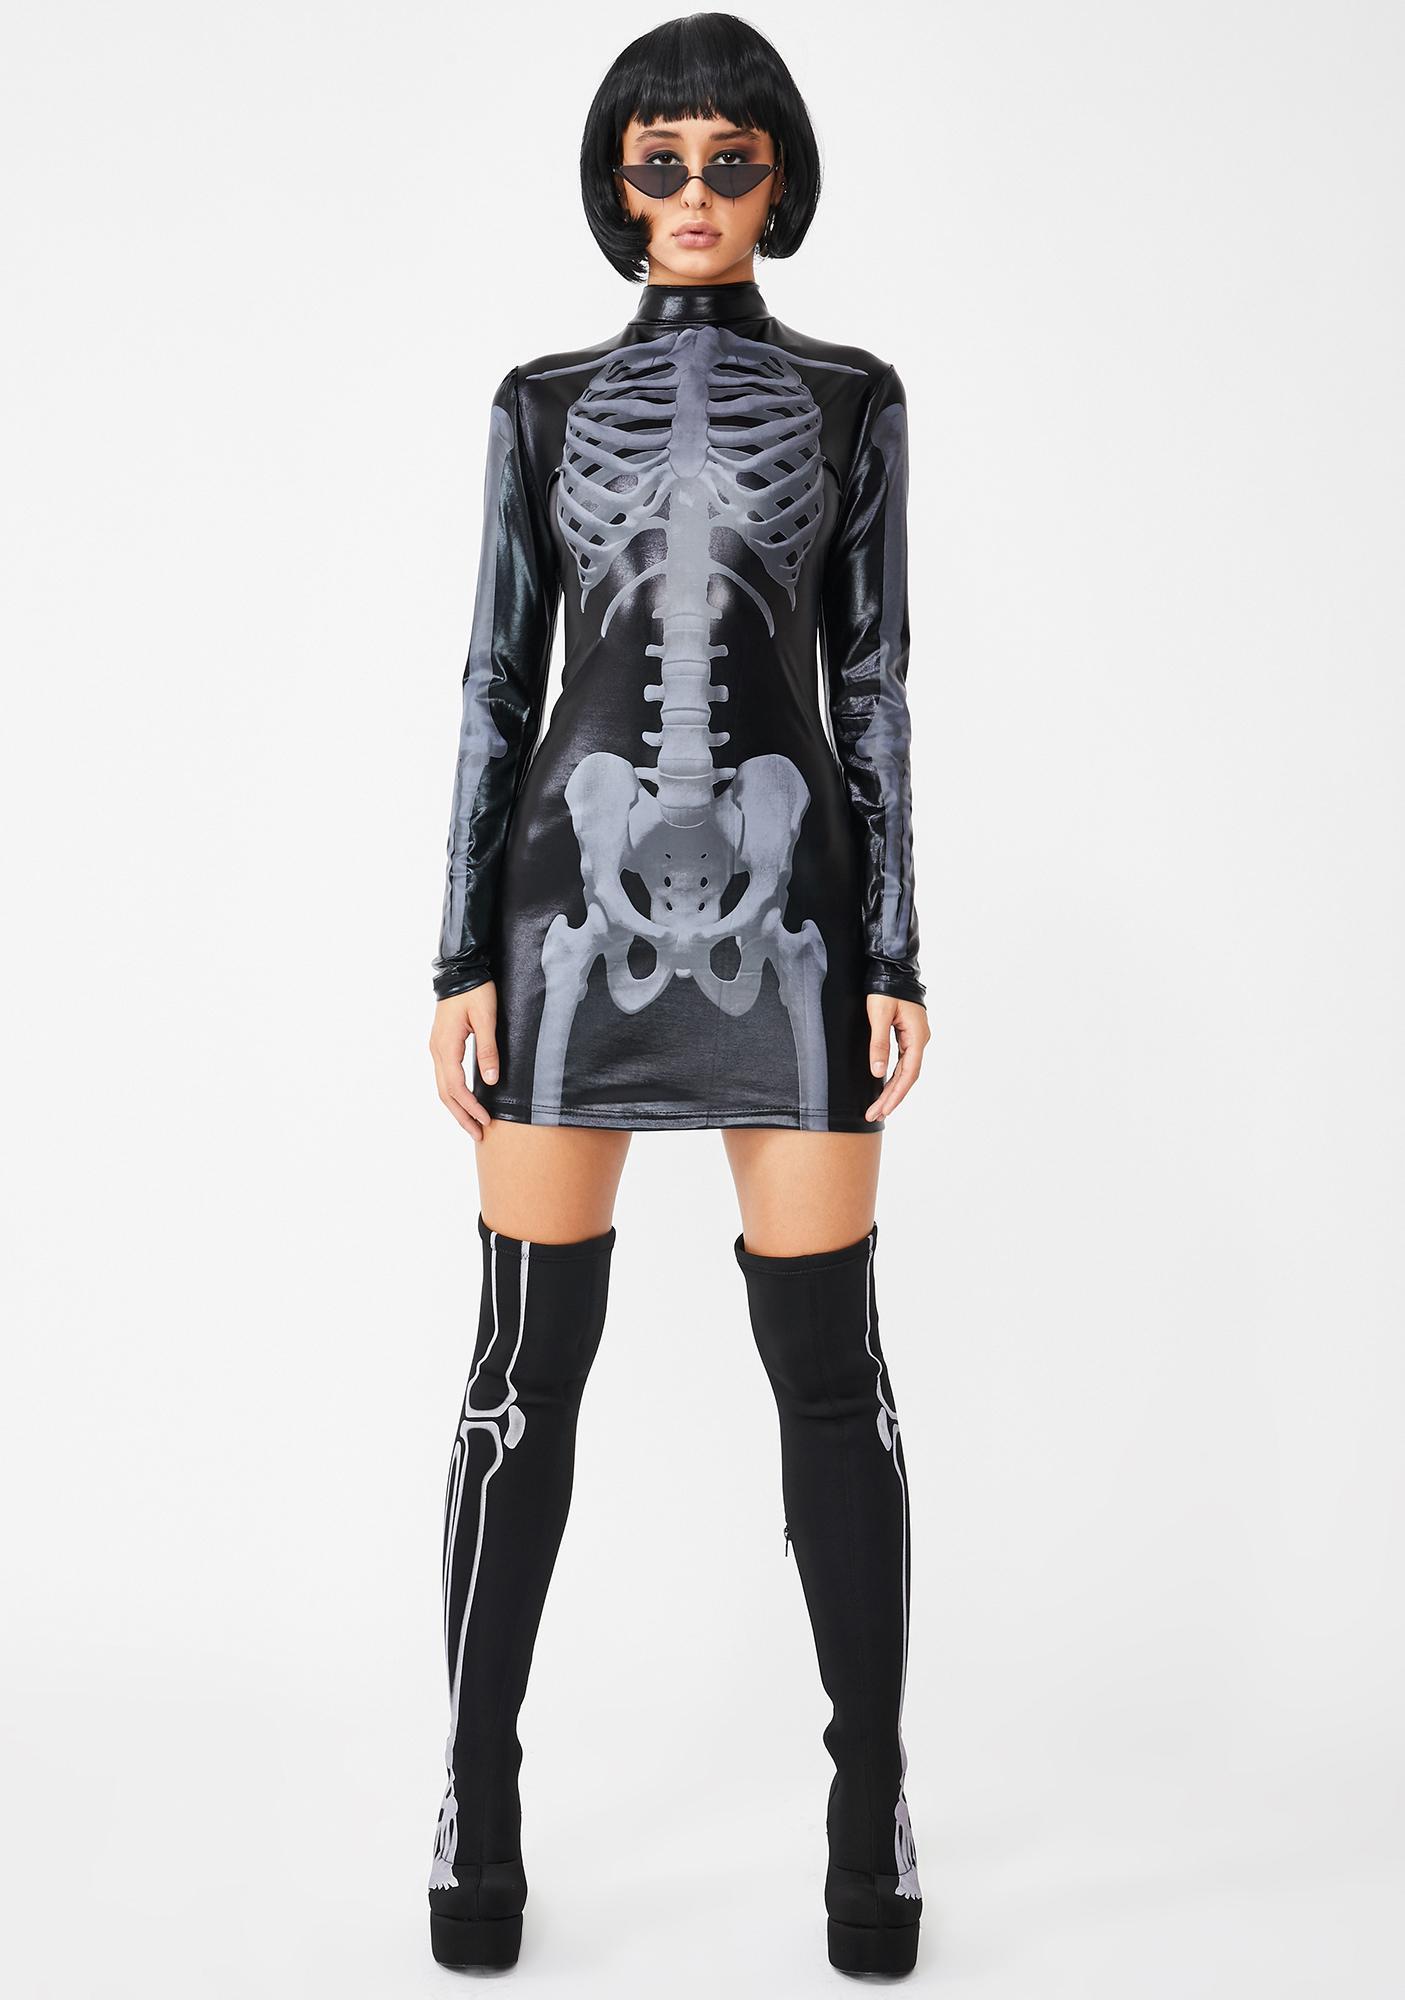 Rattle Your Bones Skeleton Dress